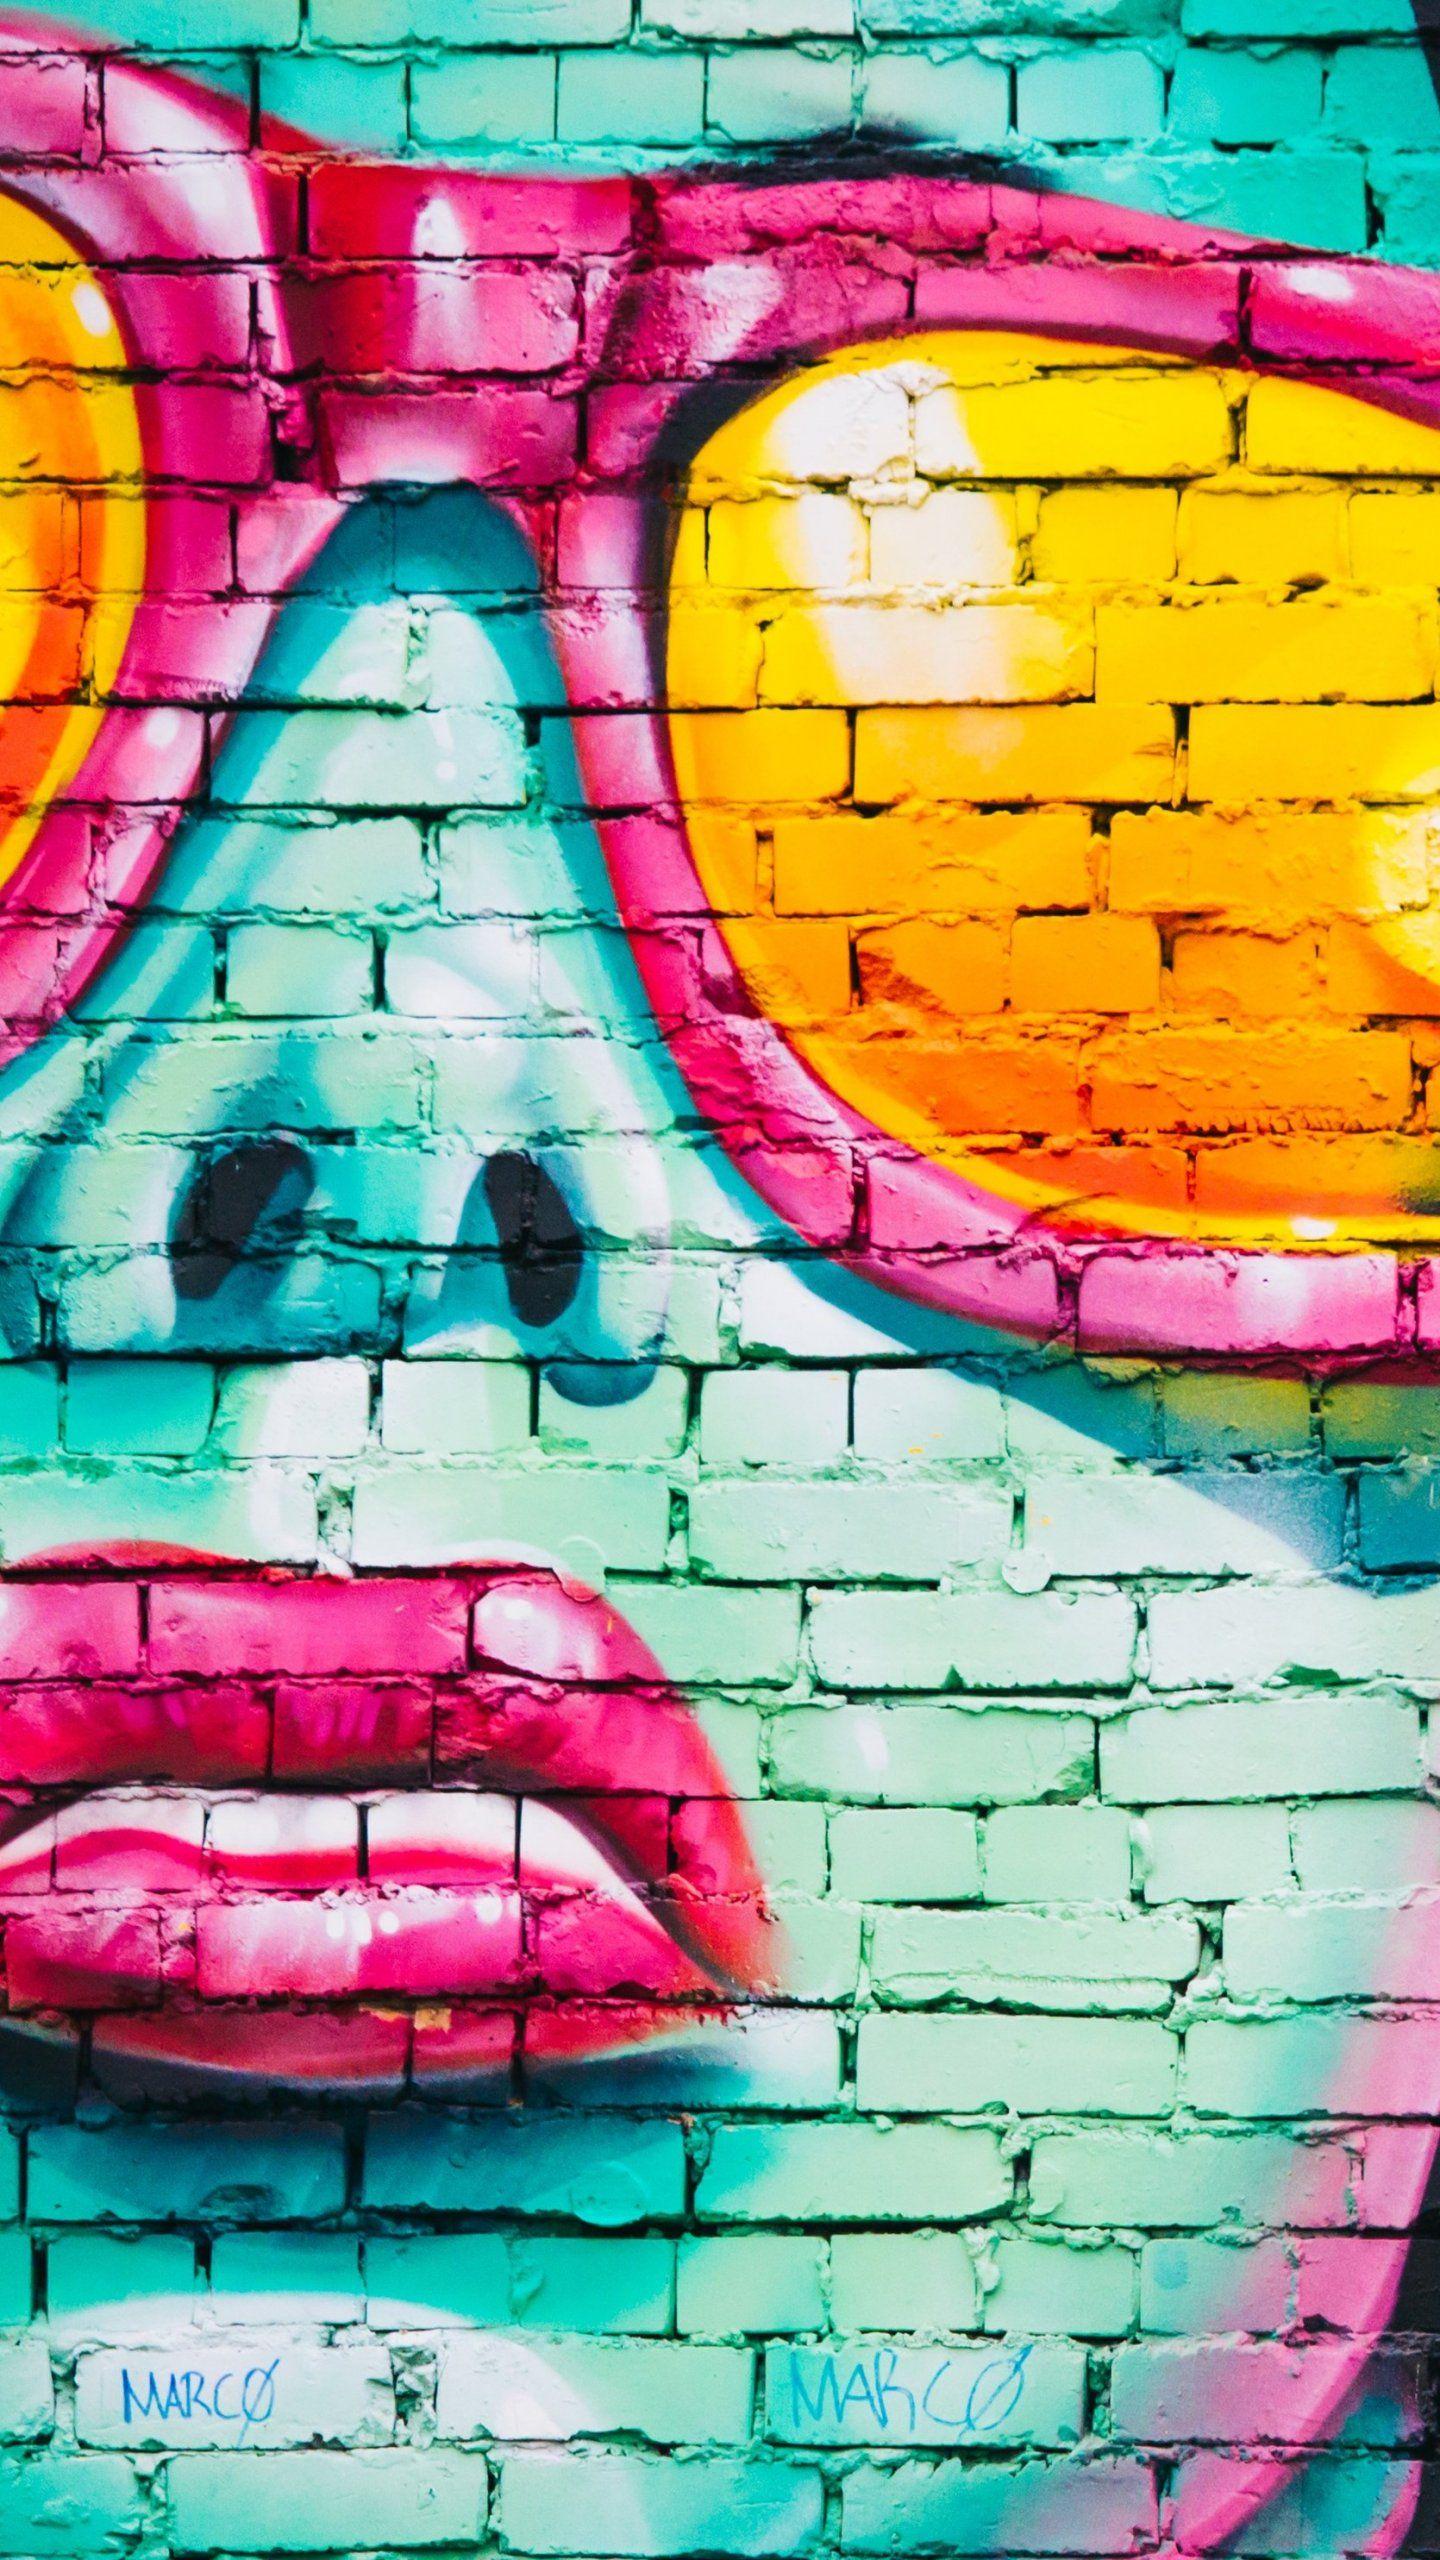 Girl With Sunglasses Graffiti Wallpaper Iphone Android Desktop Backgrounds Graffiti Wallpaper Iphone Graffiti Wallpaper Iphone Wallpaper